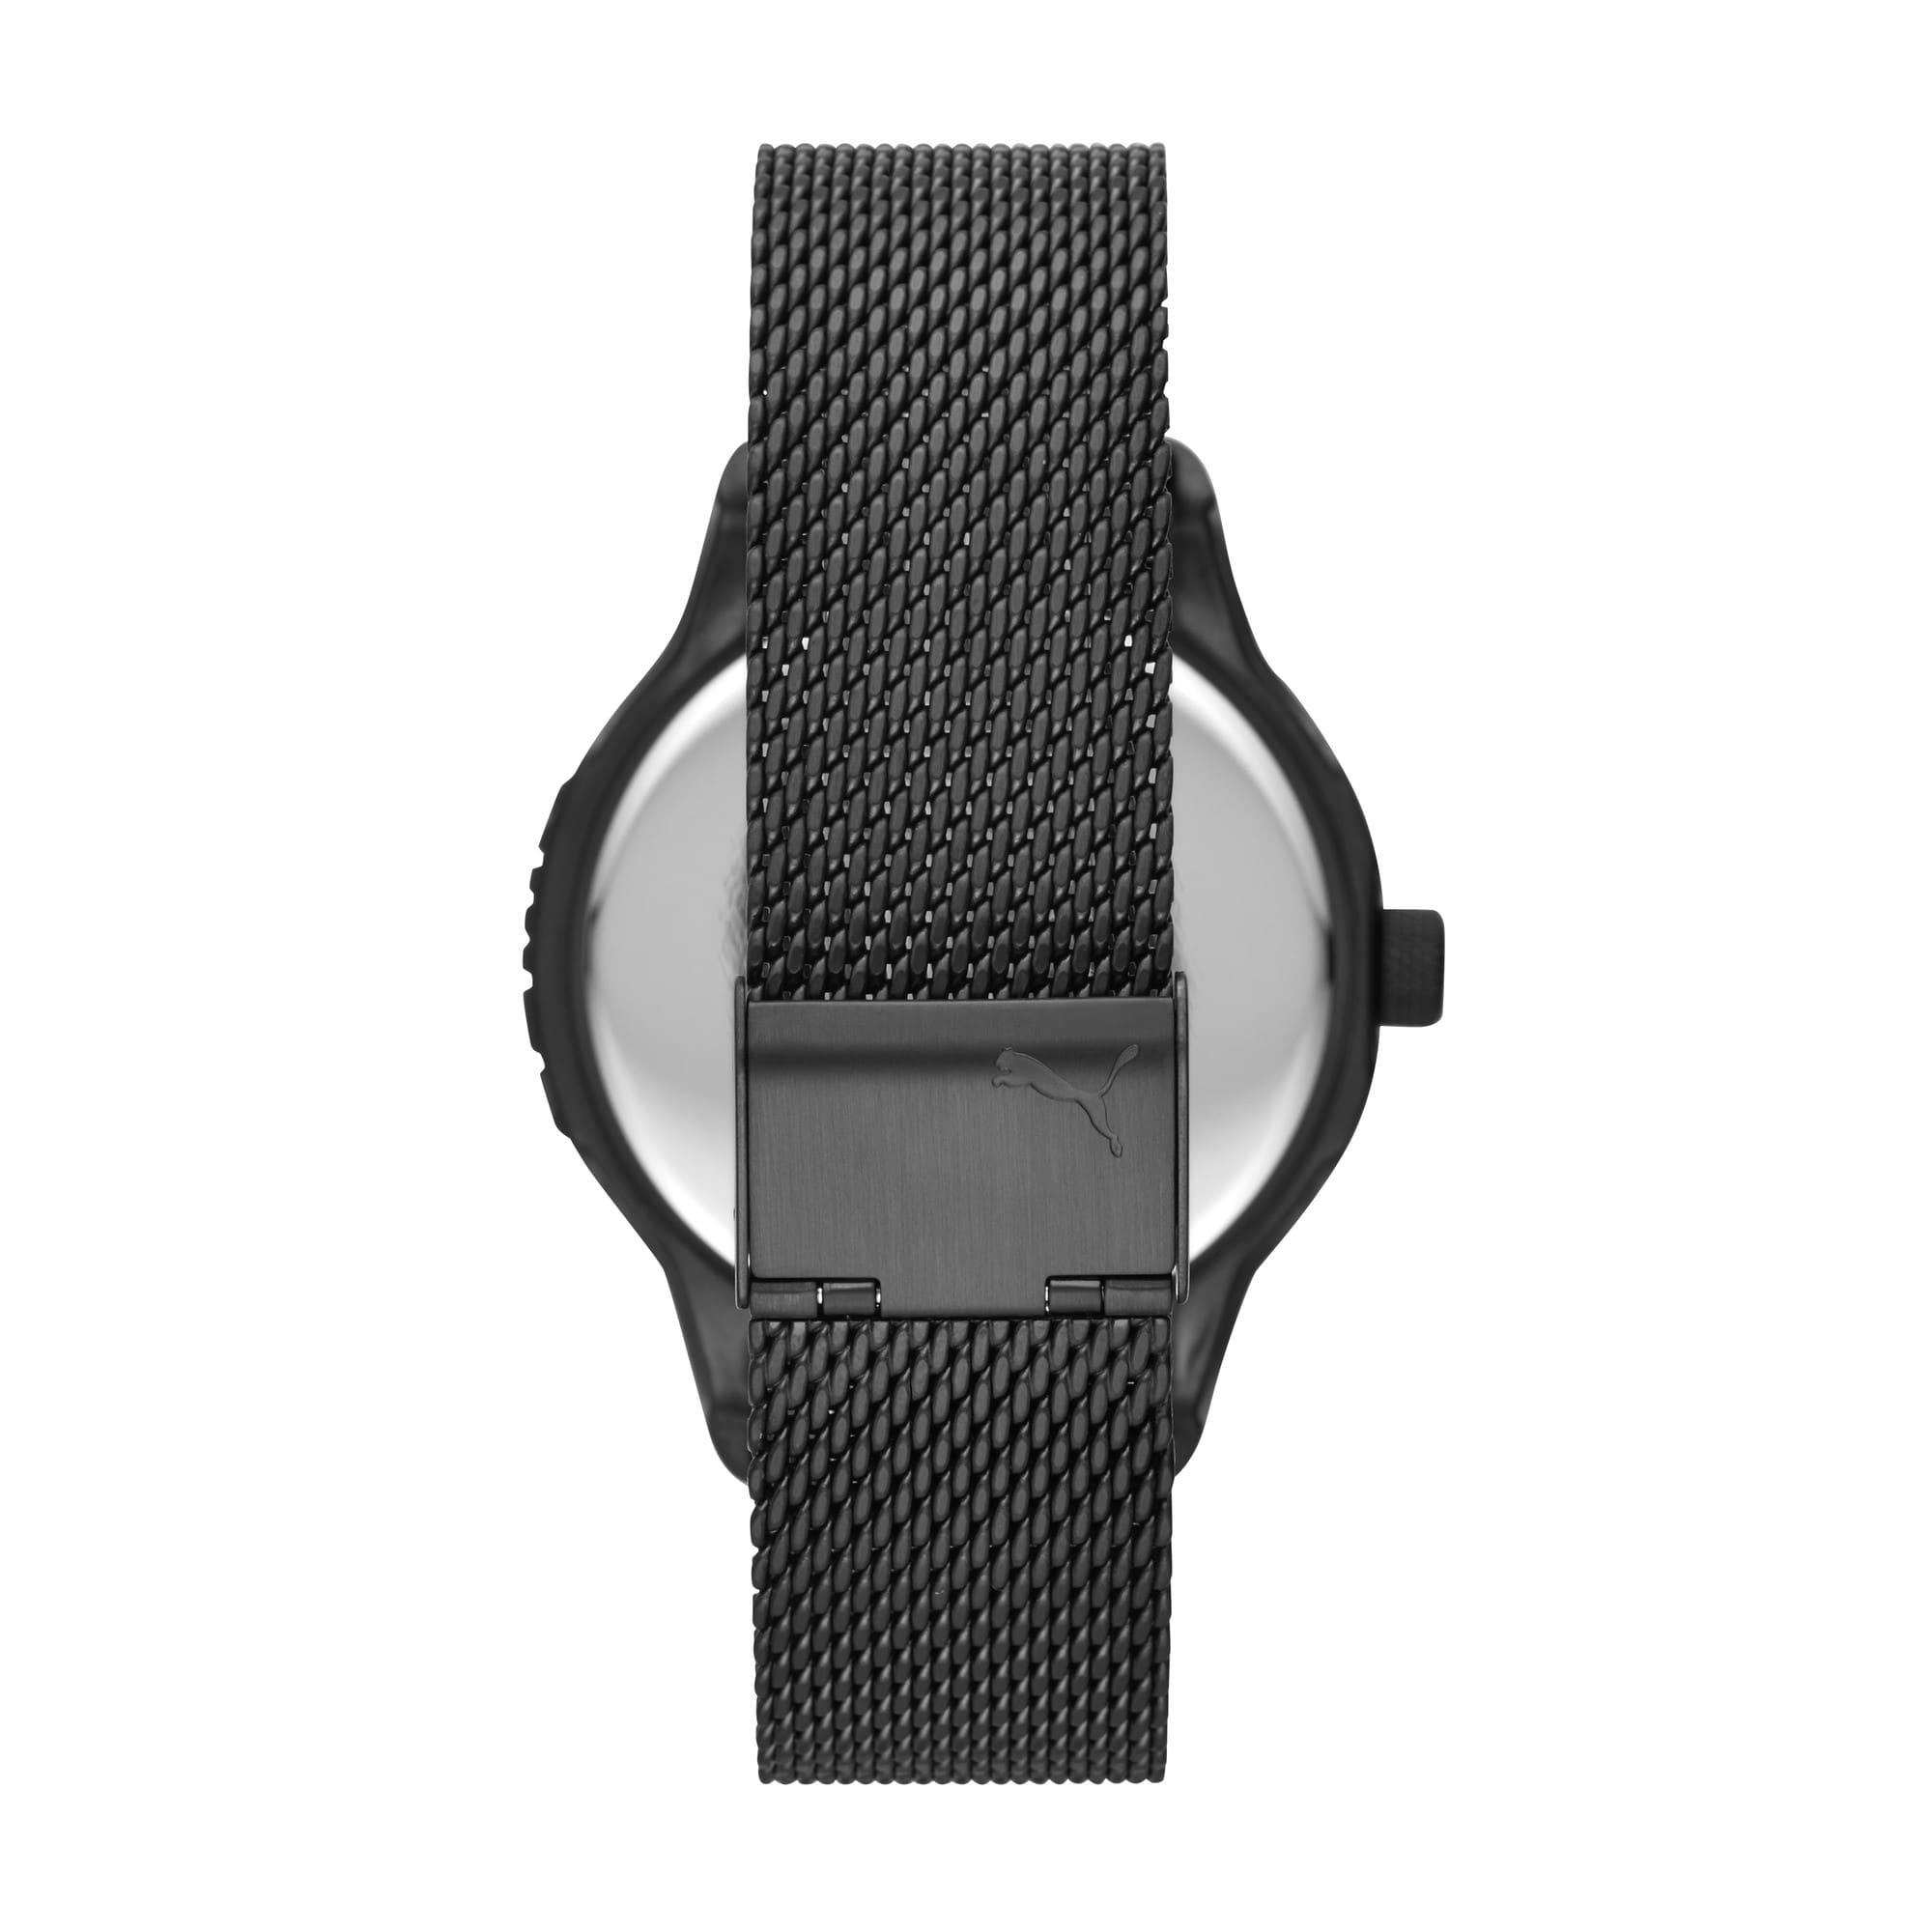 Thumbnail 3 of Reset v1 Watch, Black/Black, medium